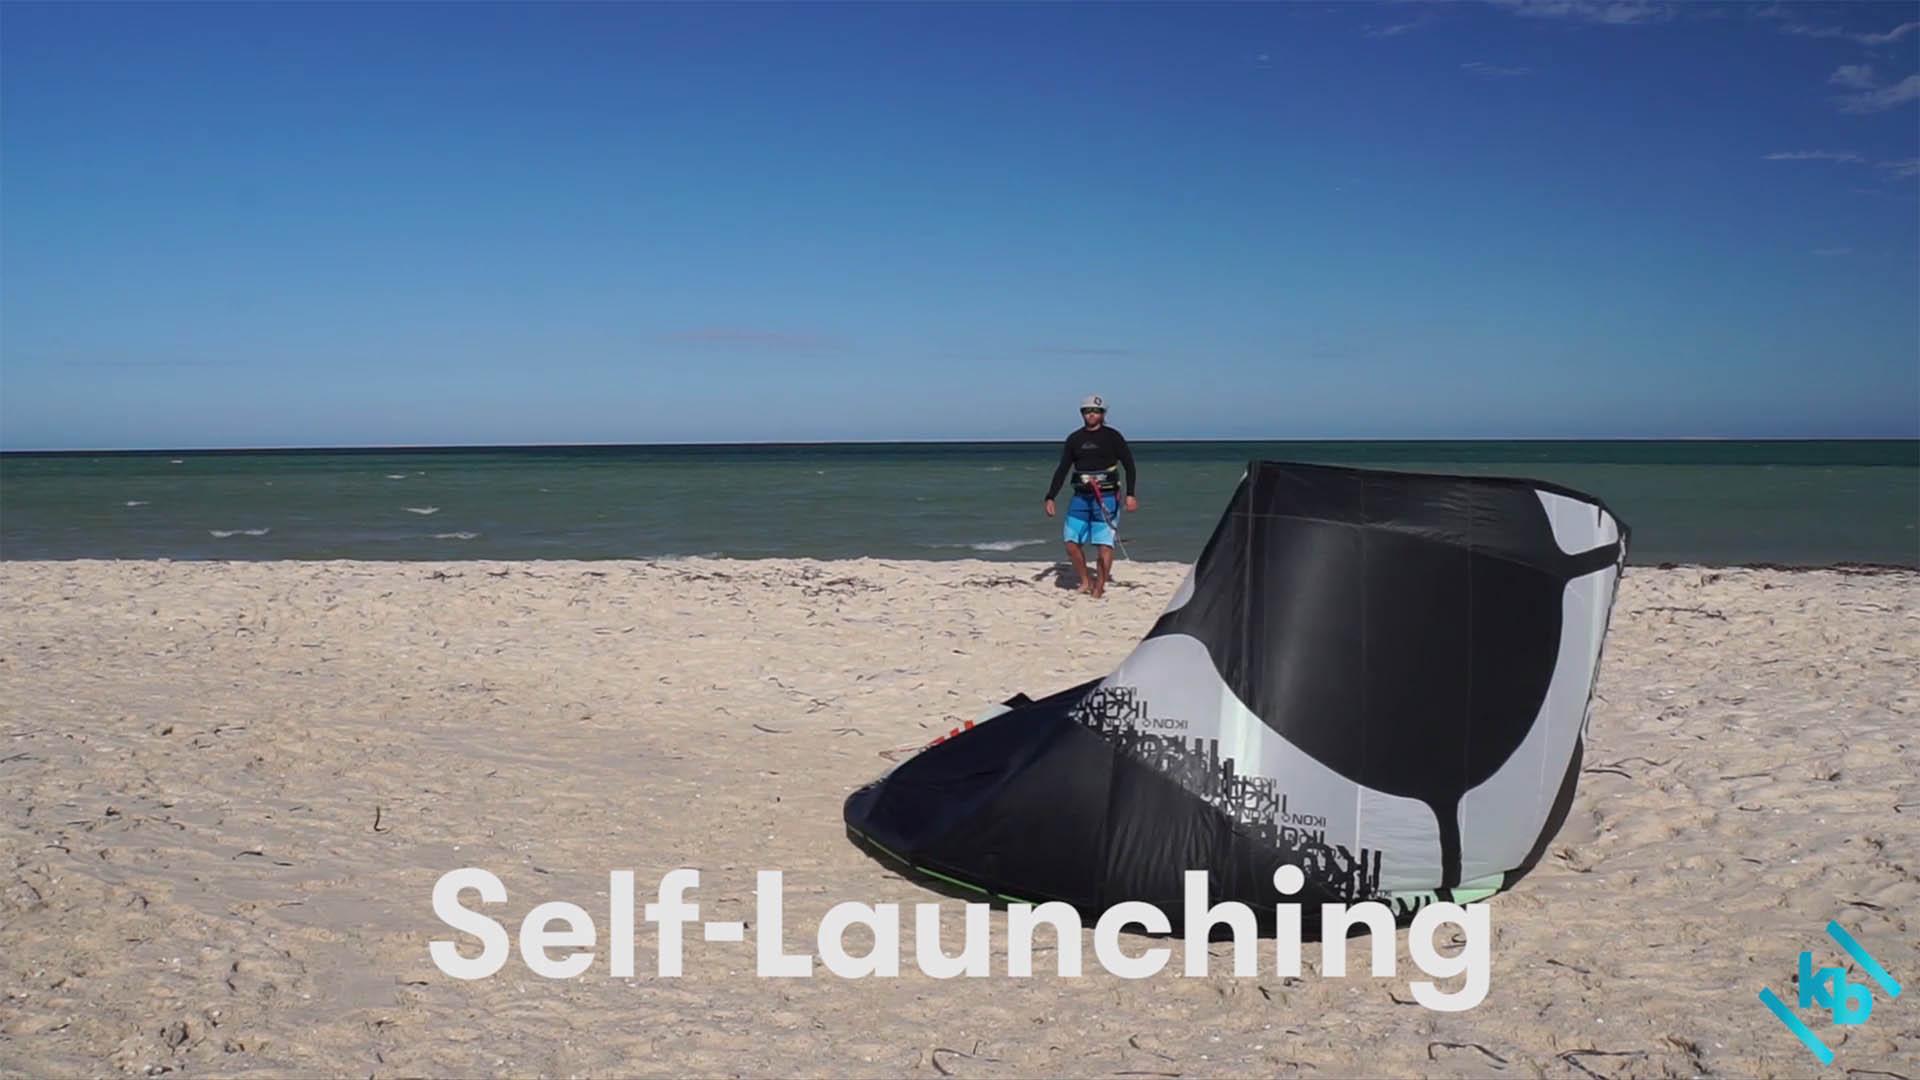 Kitesurfing Self-launching Kitesurfing Lessons Perth